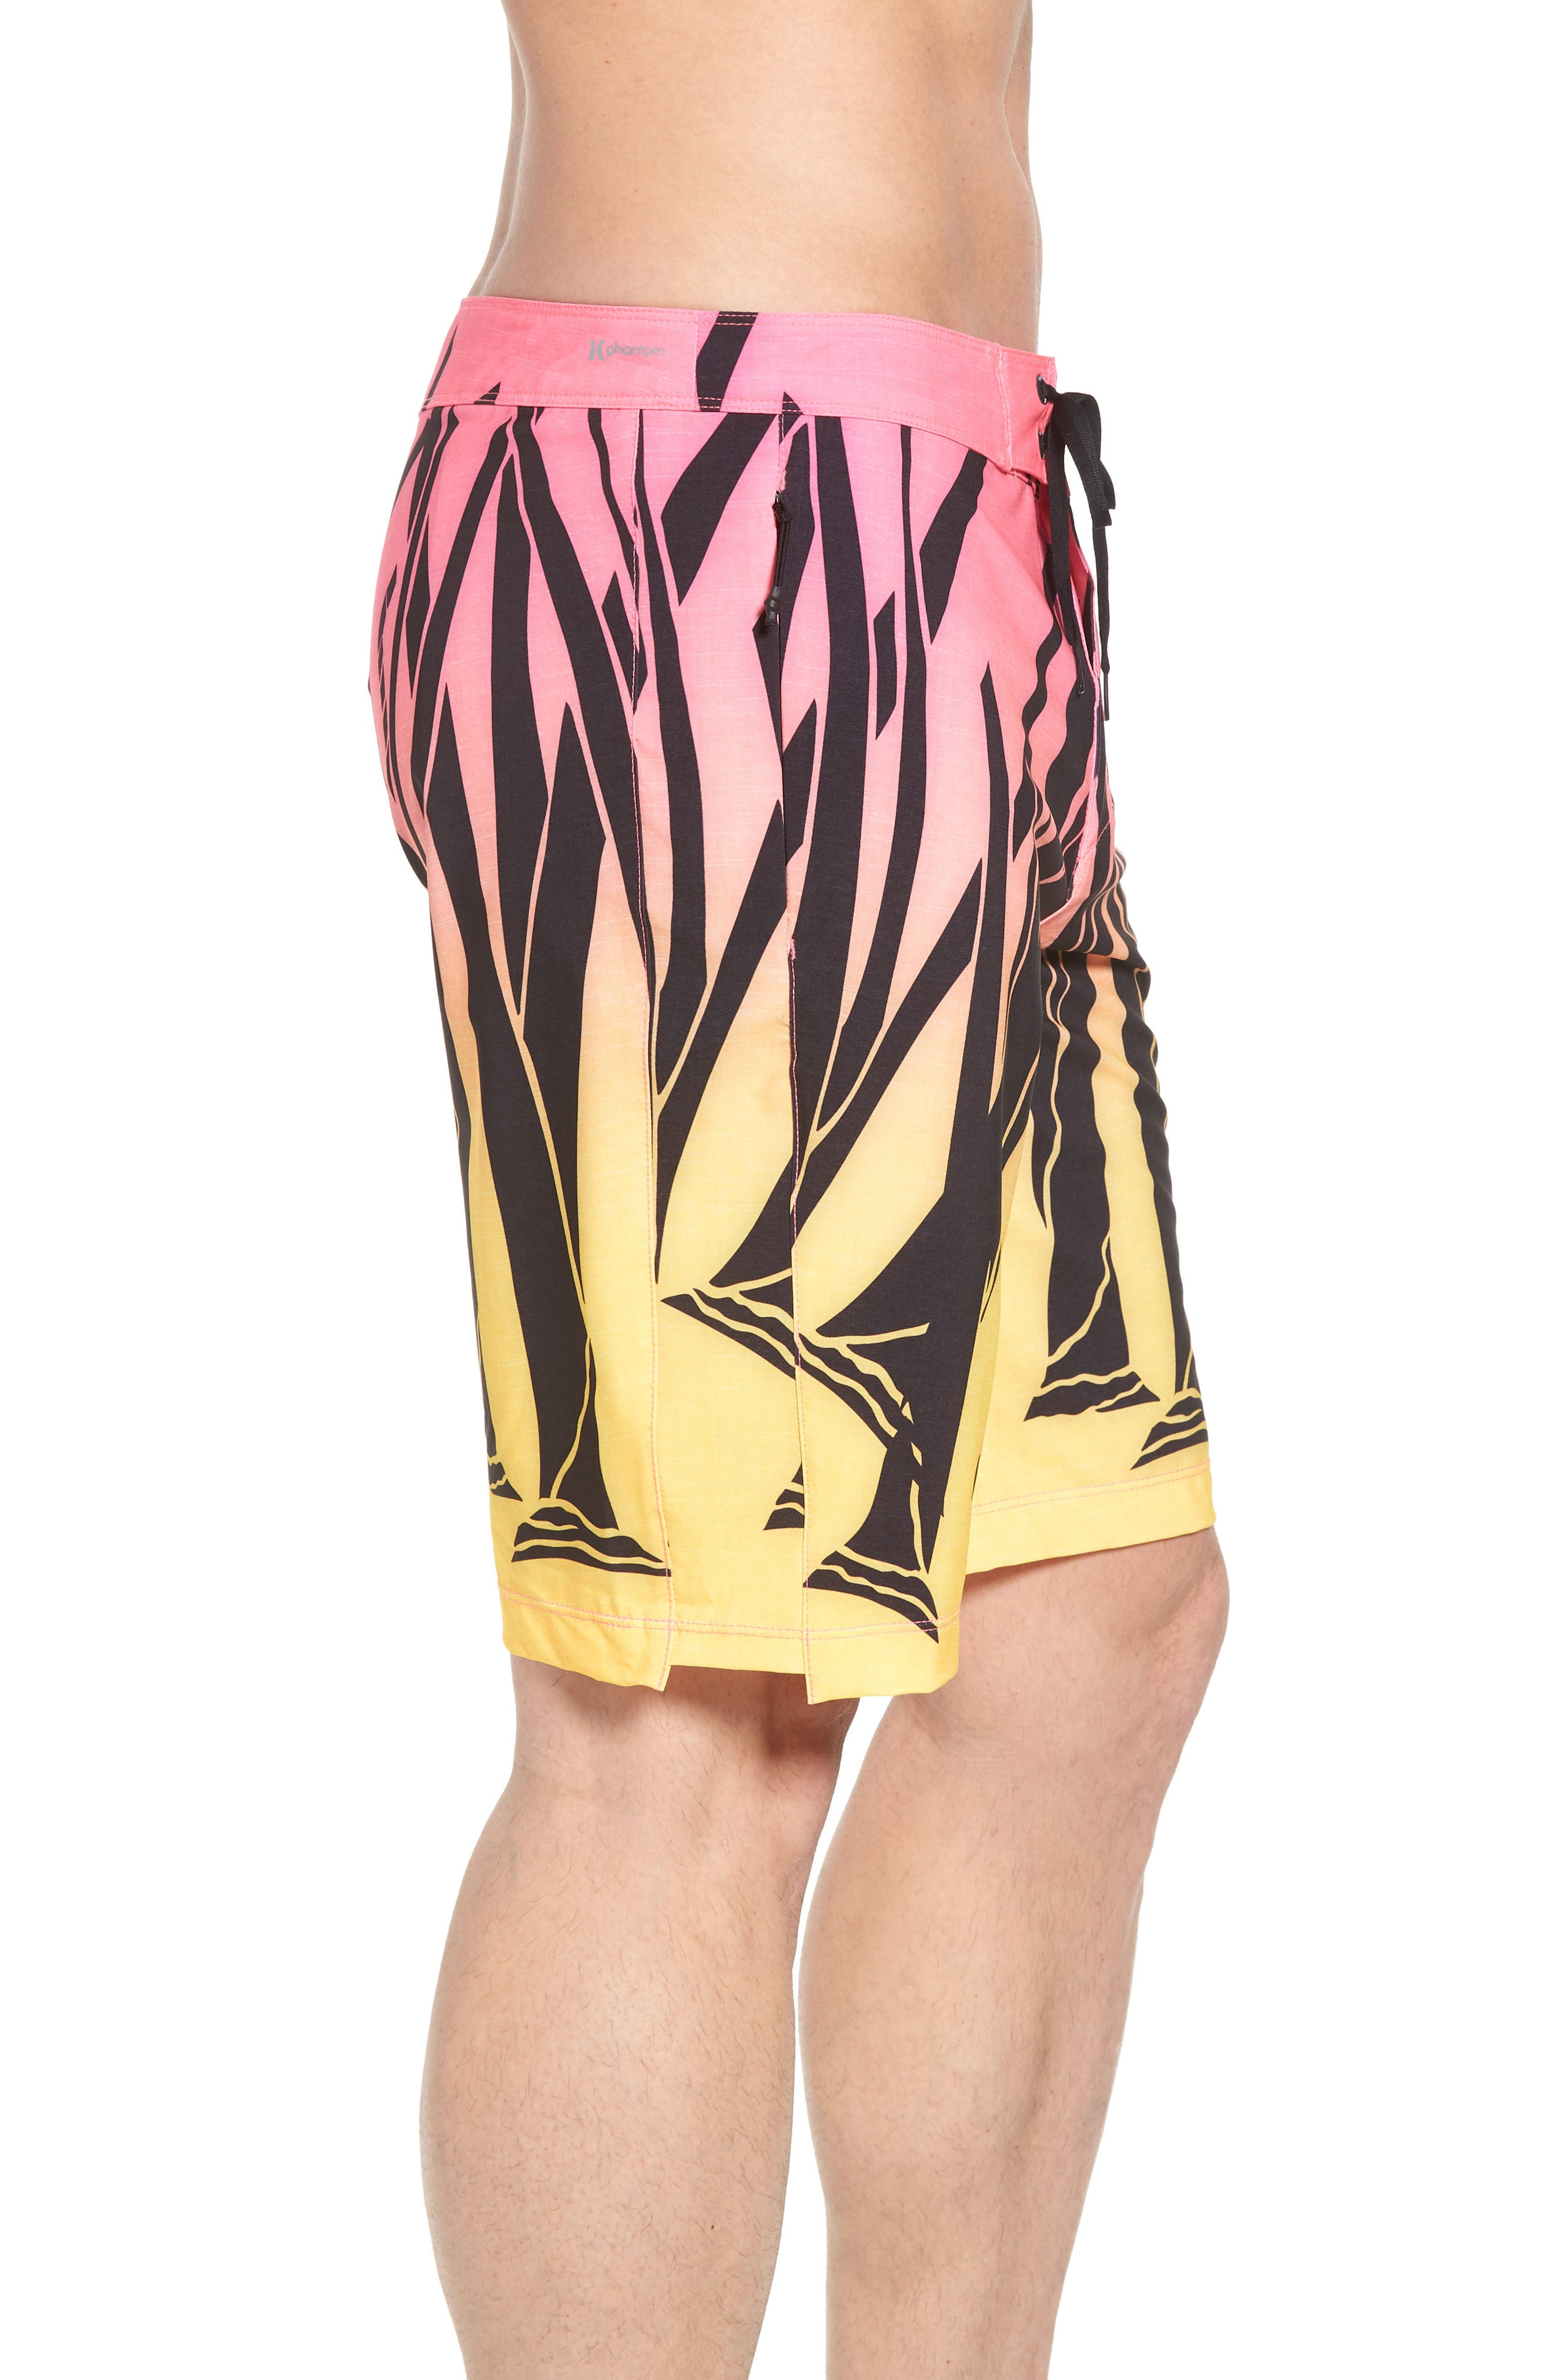 JJF IV Kahuliwae Board Shorts,                             Alternate thumbnail 4, color,                             Hyper Pink